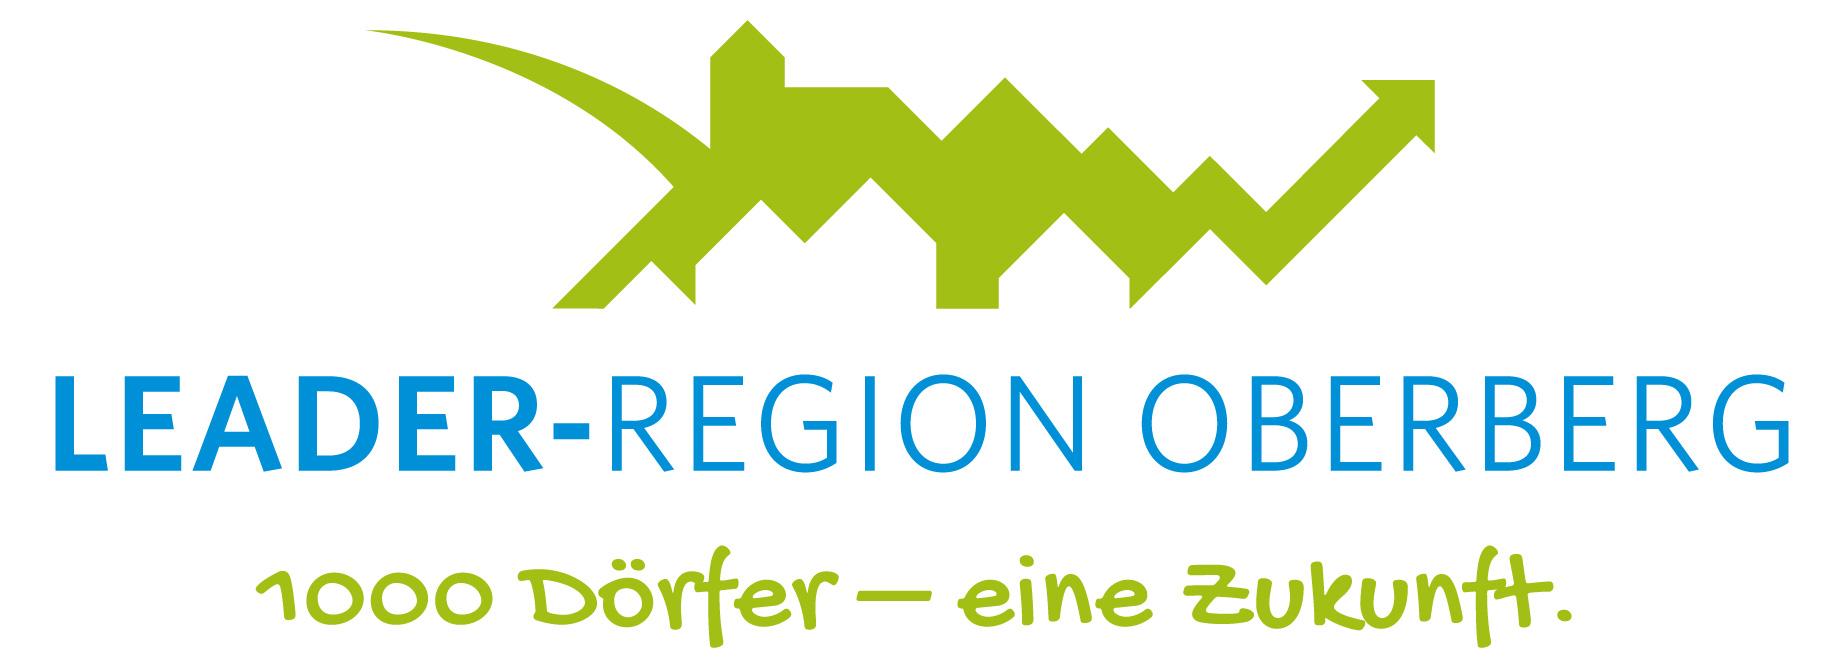 Logo der LEADER Region Oberberg Freibad Bielstein (Foto: Michael Welp)